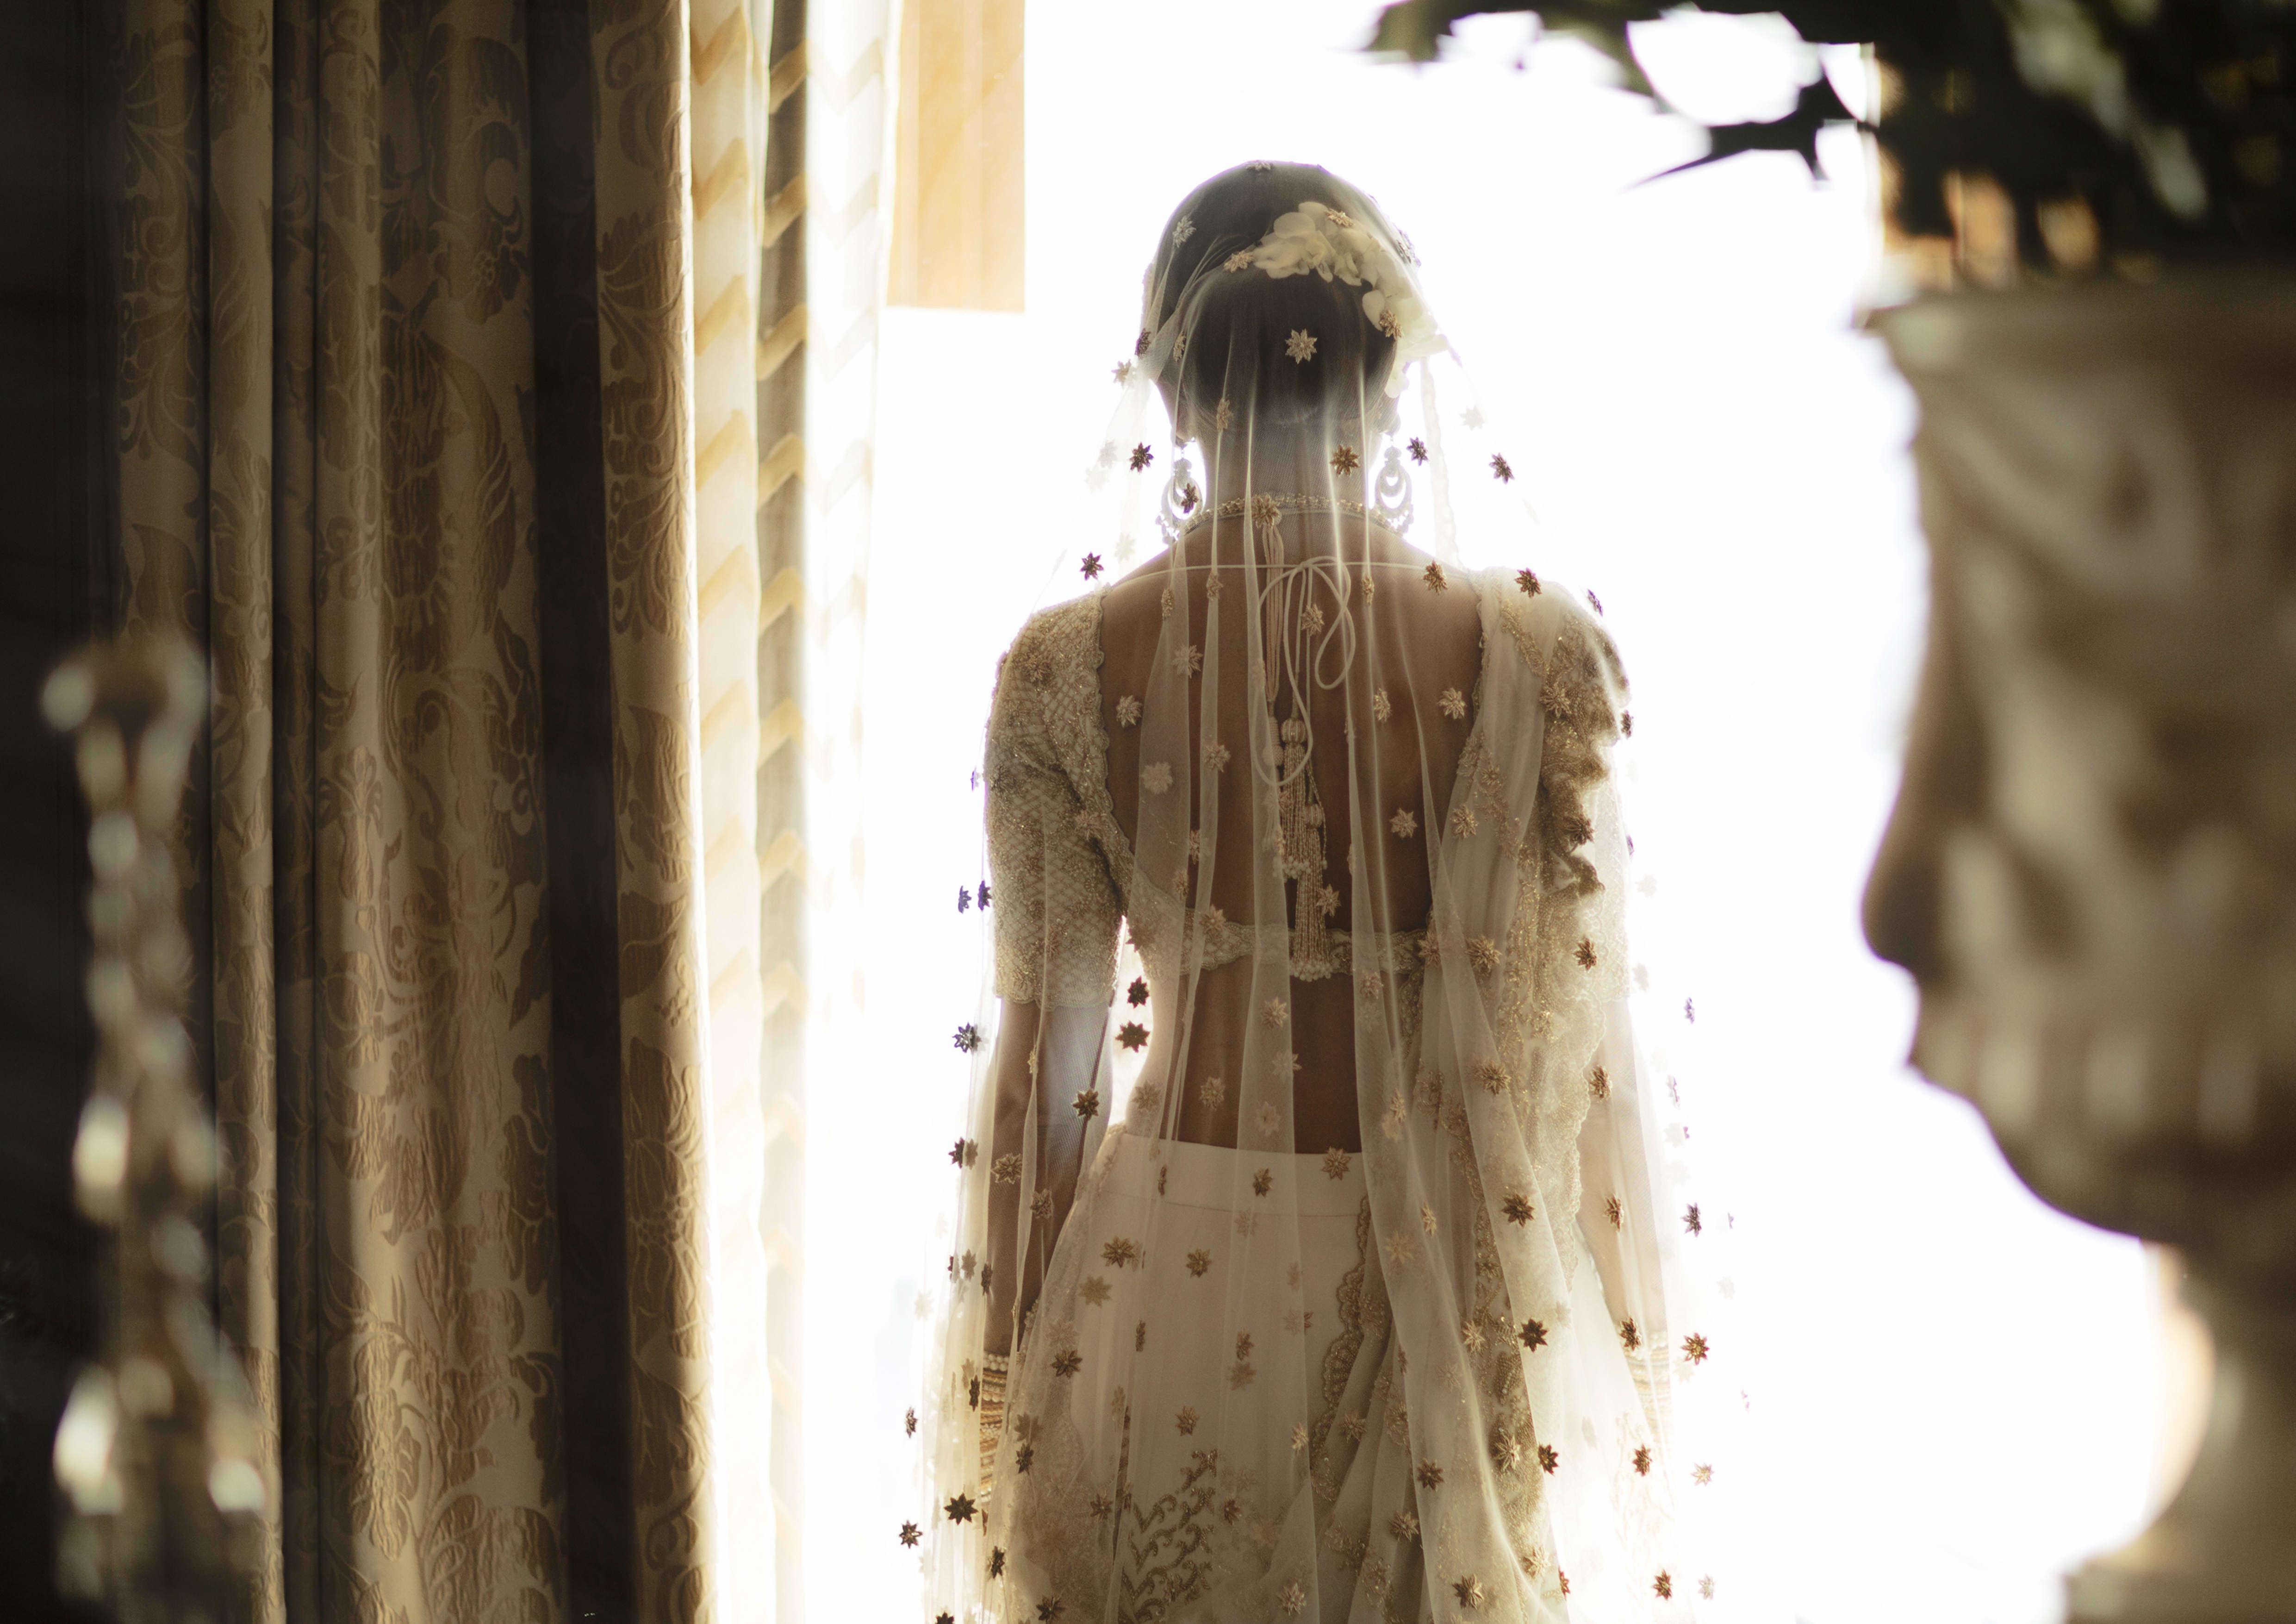 the spectacular bride!:tribhovandas bhimji zaveri ltd., namrata soni makup artist